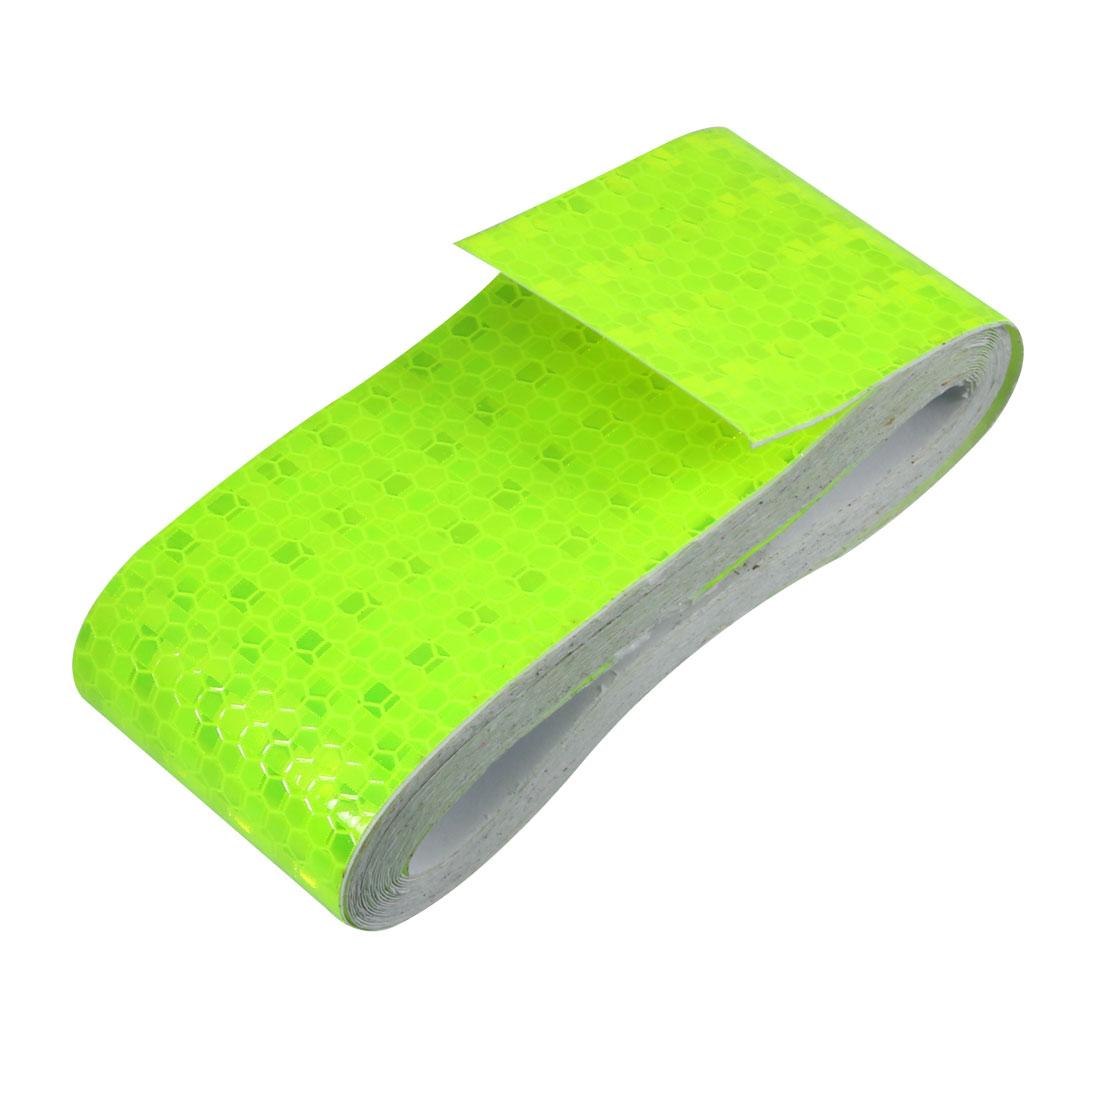 Honeycomb Reflective Warning Tape Film Sticker Yellow 50mm Width 5m Long